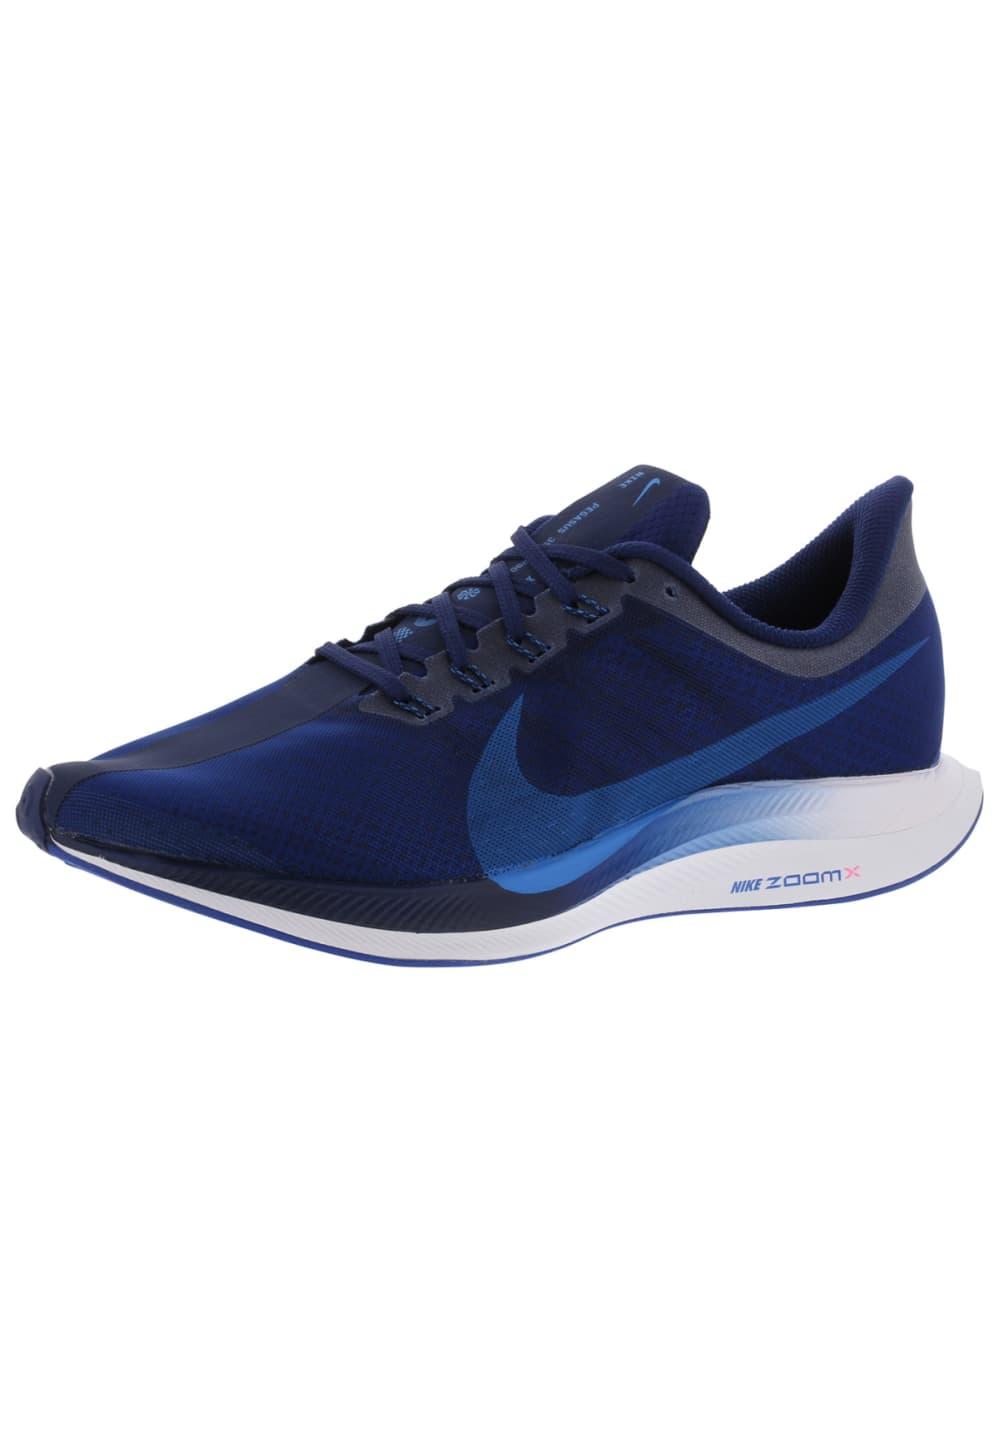 sale retailer 15e42 13b5c Nike Zoom Pegasus Turbo - Running shoes for Men - Blue